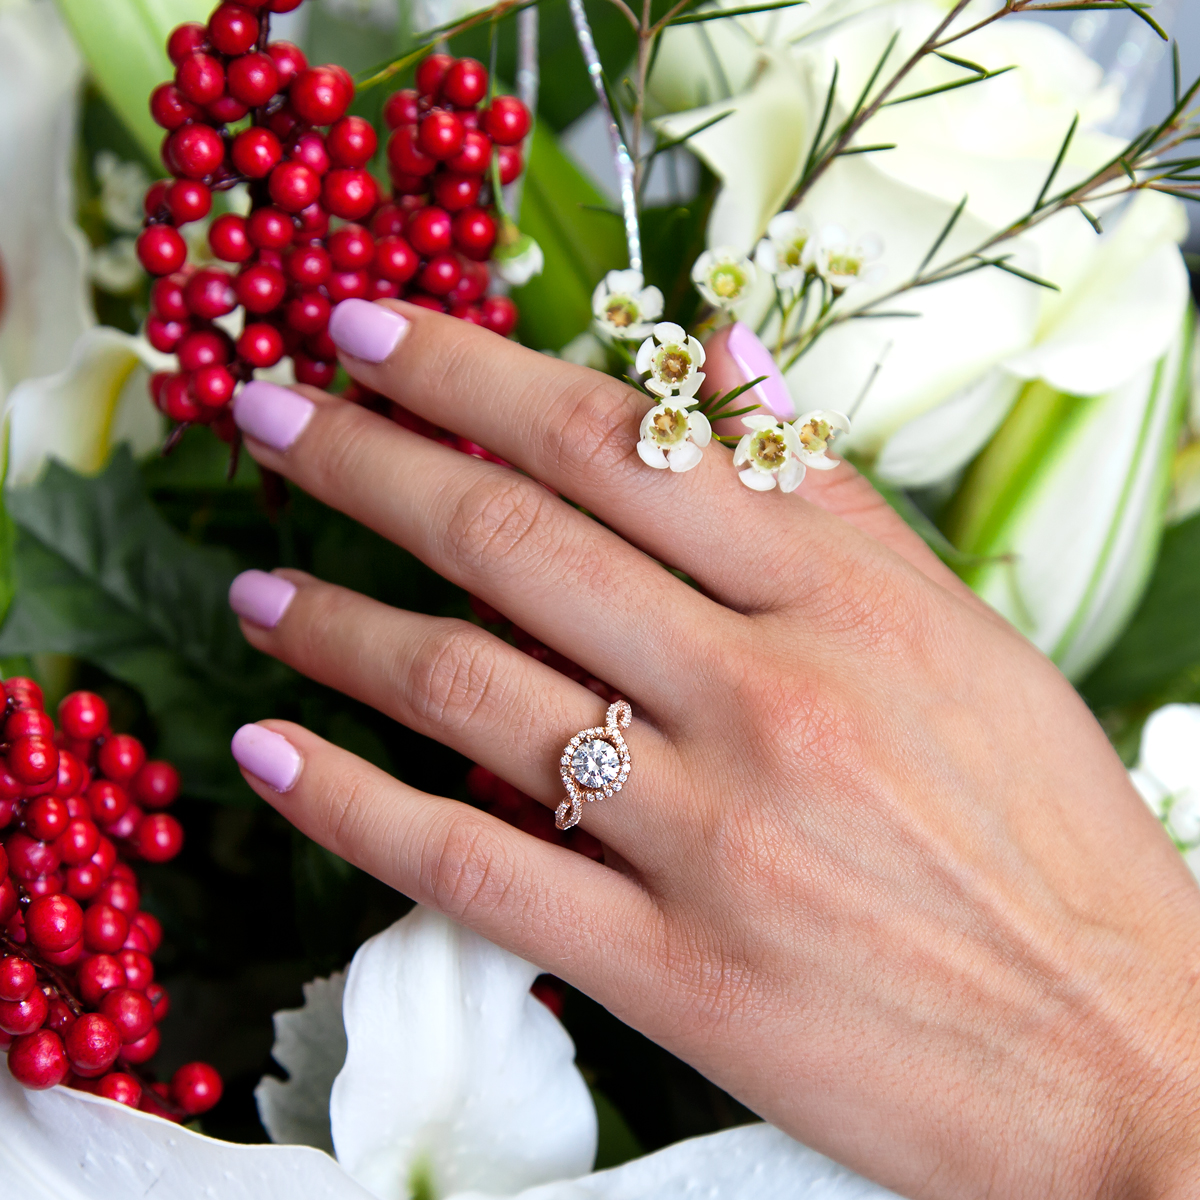 Austin Brides' Favorite Coast Diamond Engagement Rings for the Holidays at Diamonds Direct Austin, TX